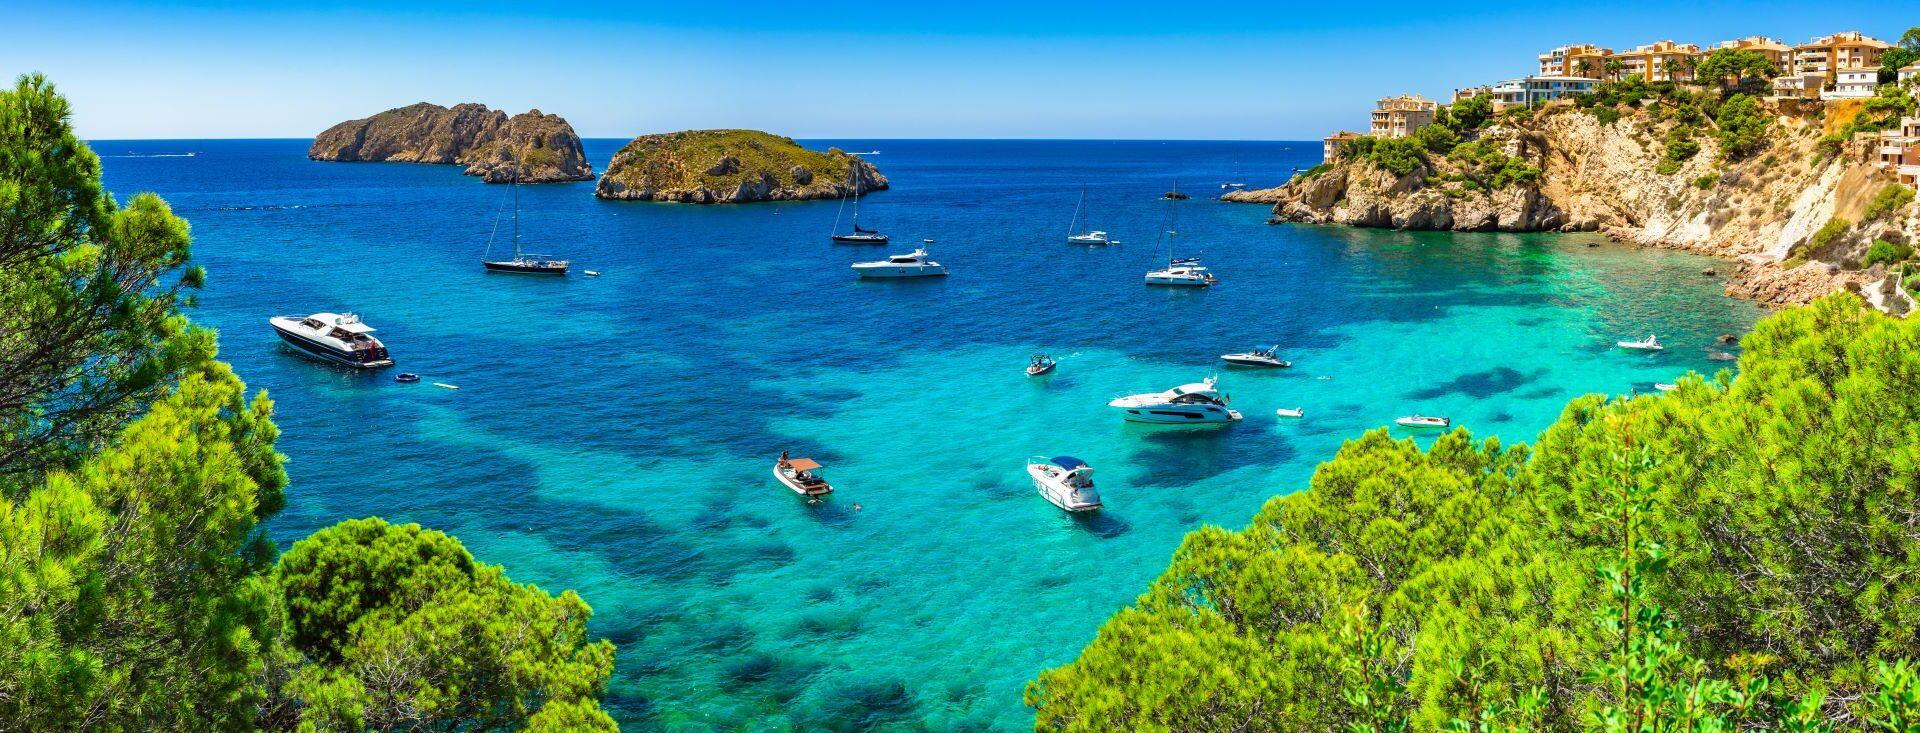 Vacanze nel Mediterraneo MAIORCA